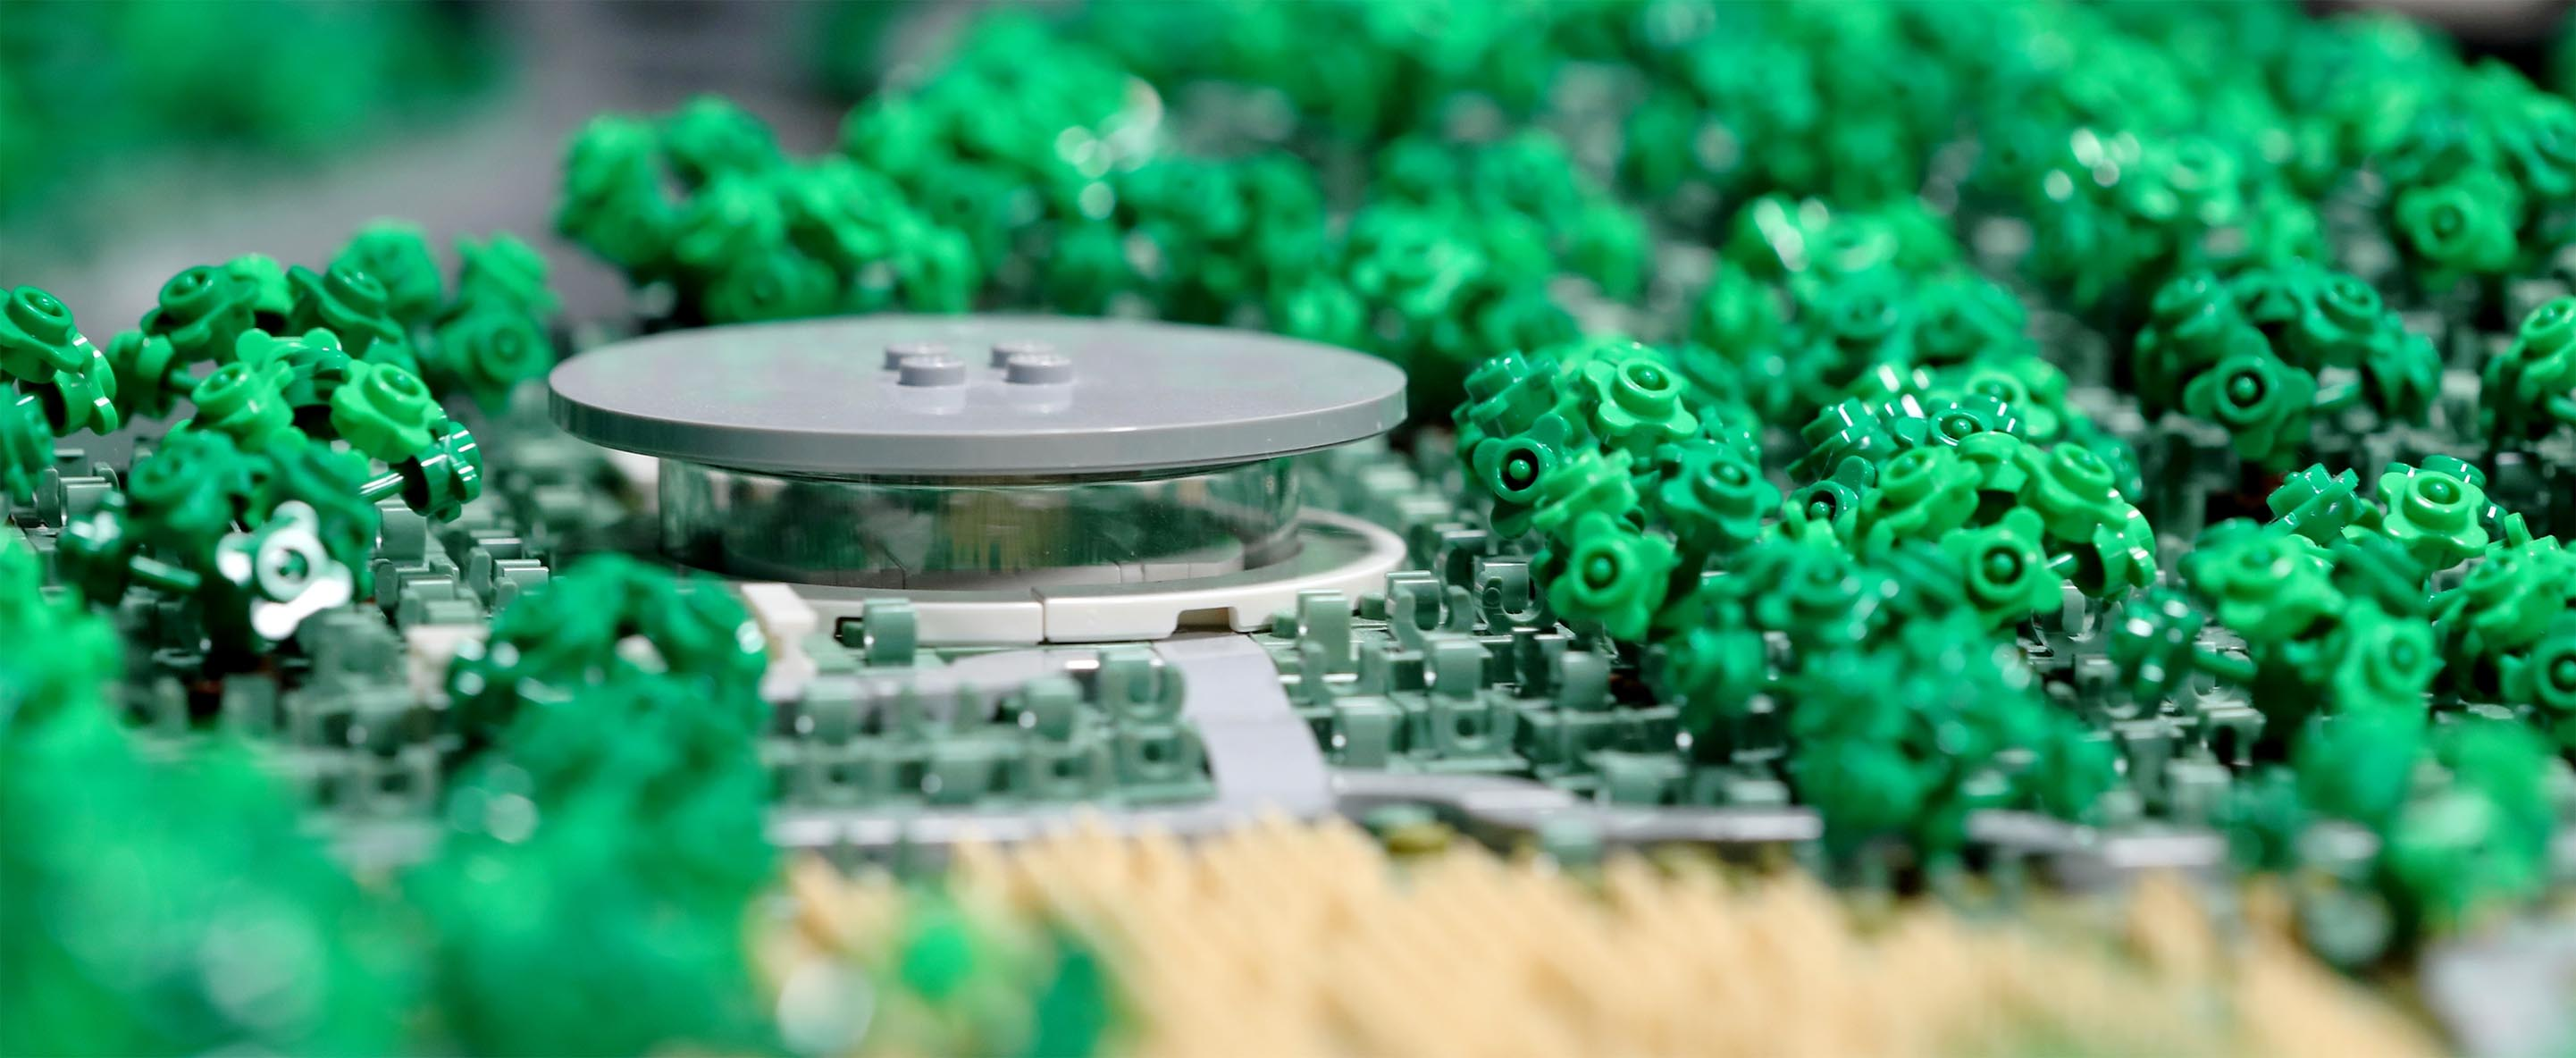 Steve Jobs Theater in Lego